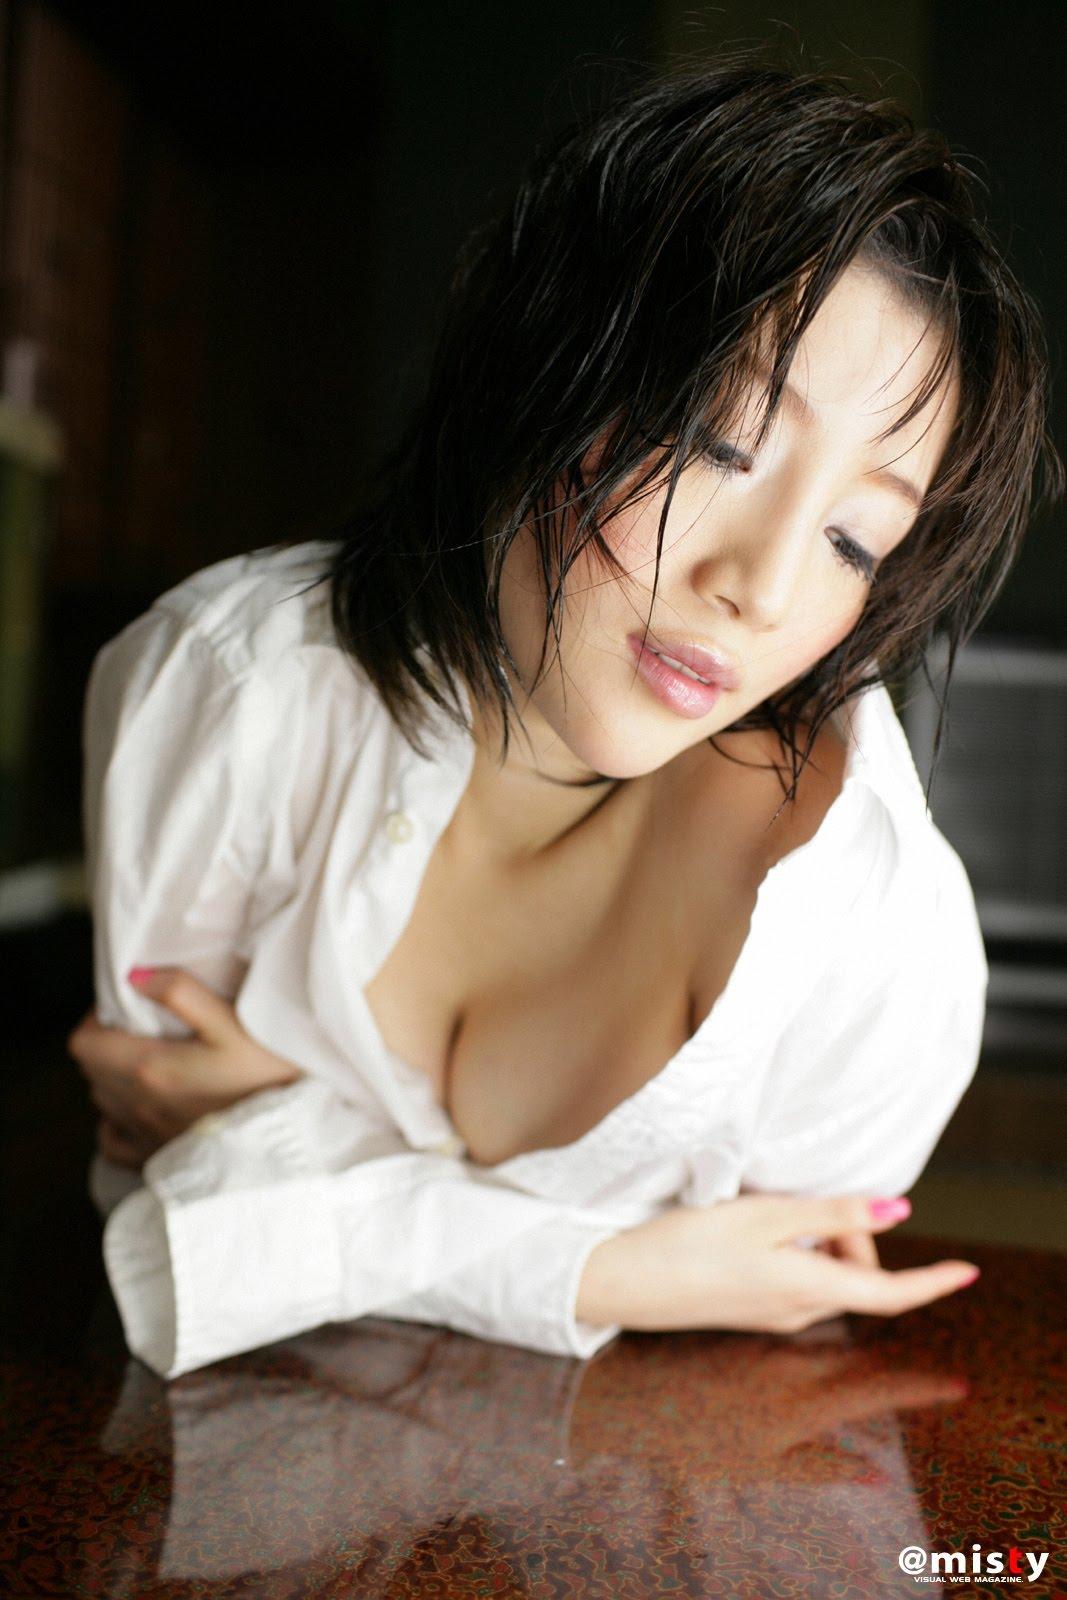 Swimsuit Mariko Shinoda nudes (92 photos) Cleavage, Facebook, see through